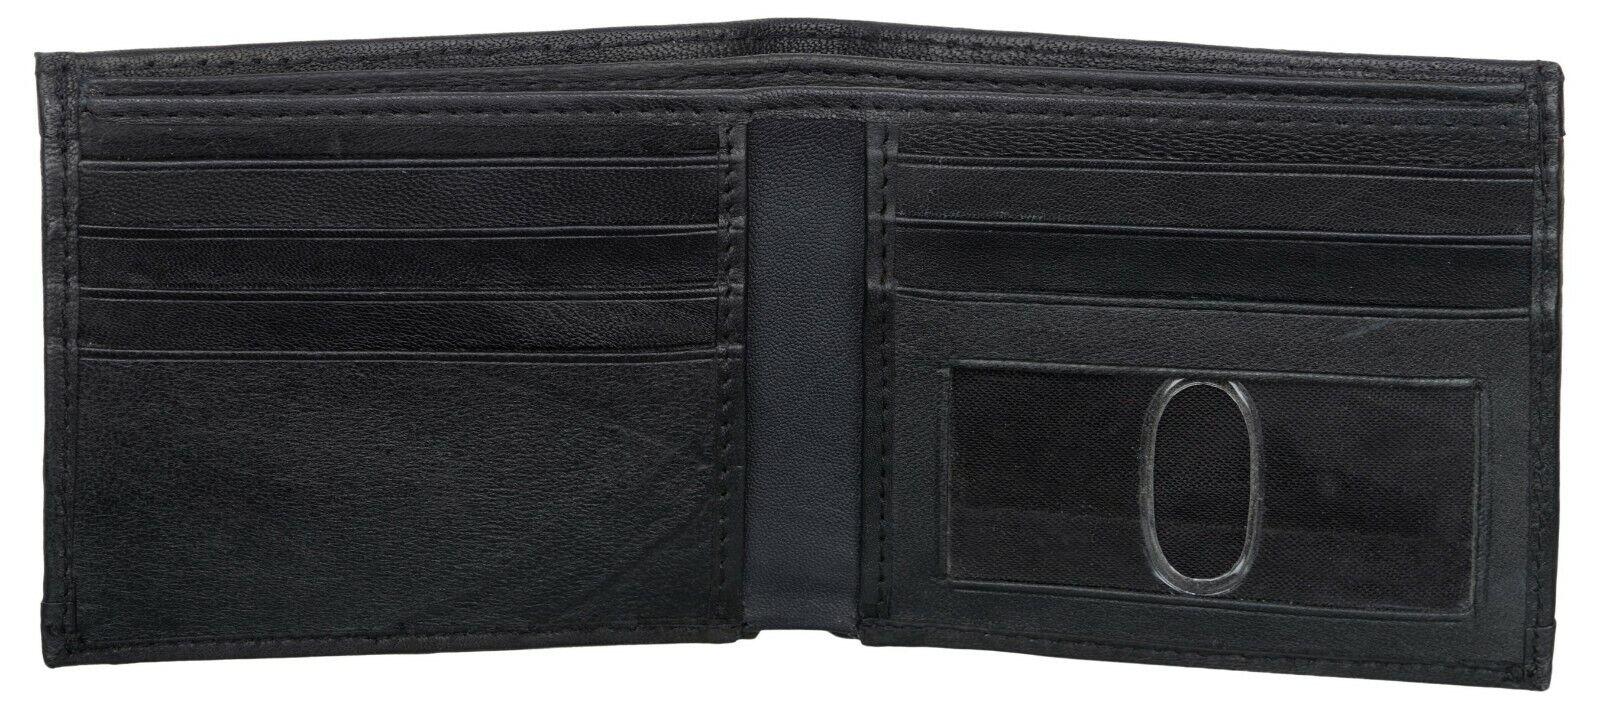 USA FLAG Men's Black RFID Blocking Genuine ID Window Leather Slim Bifold Wallet